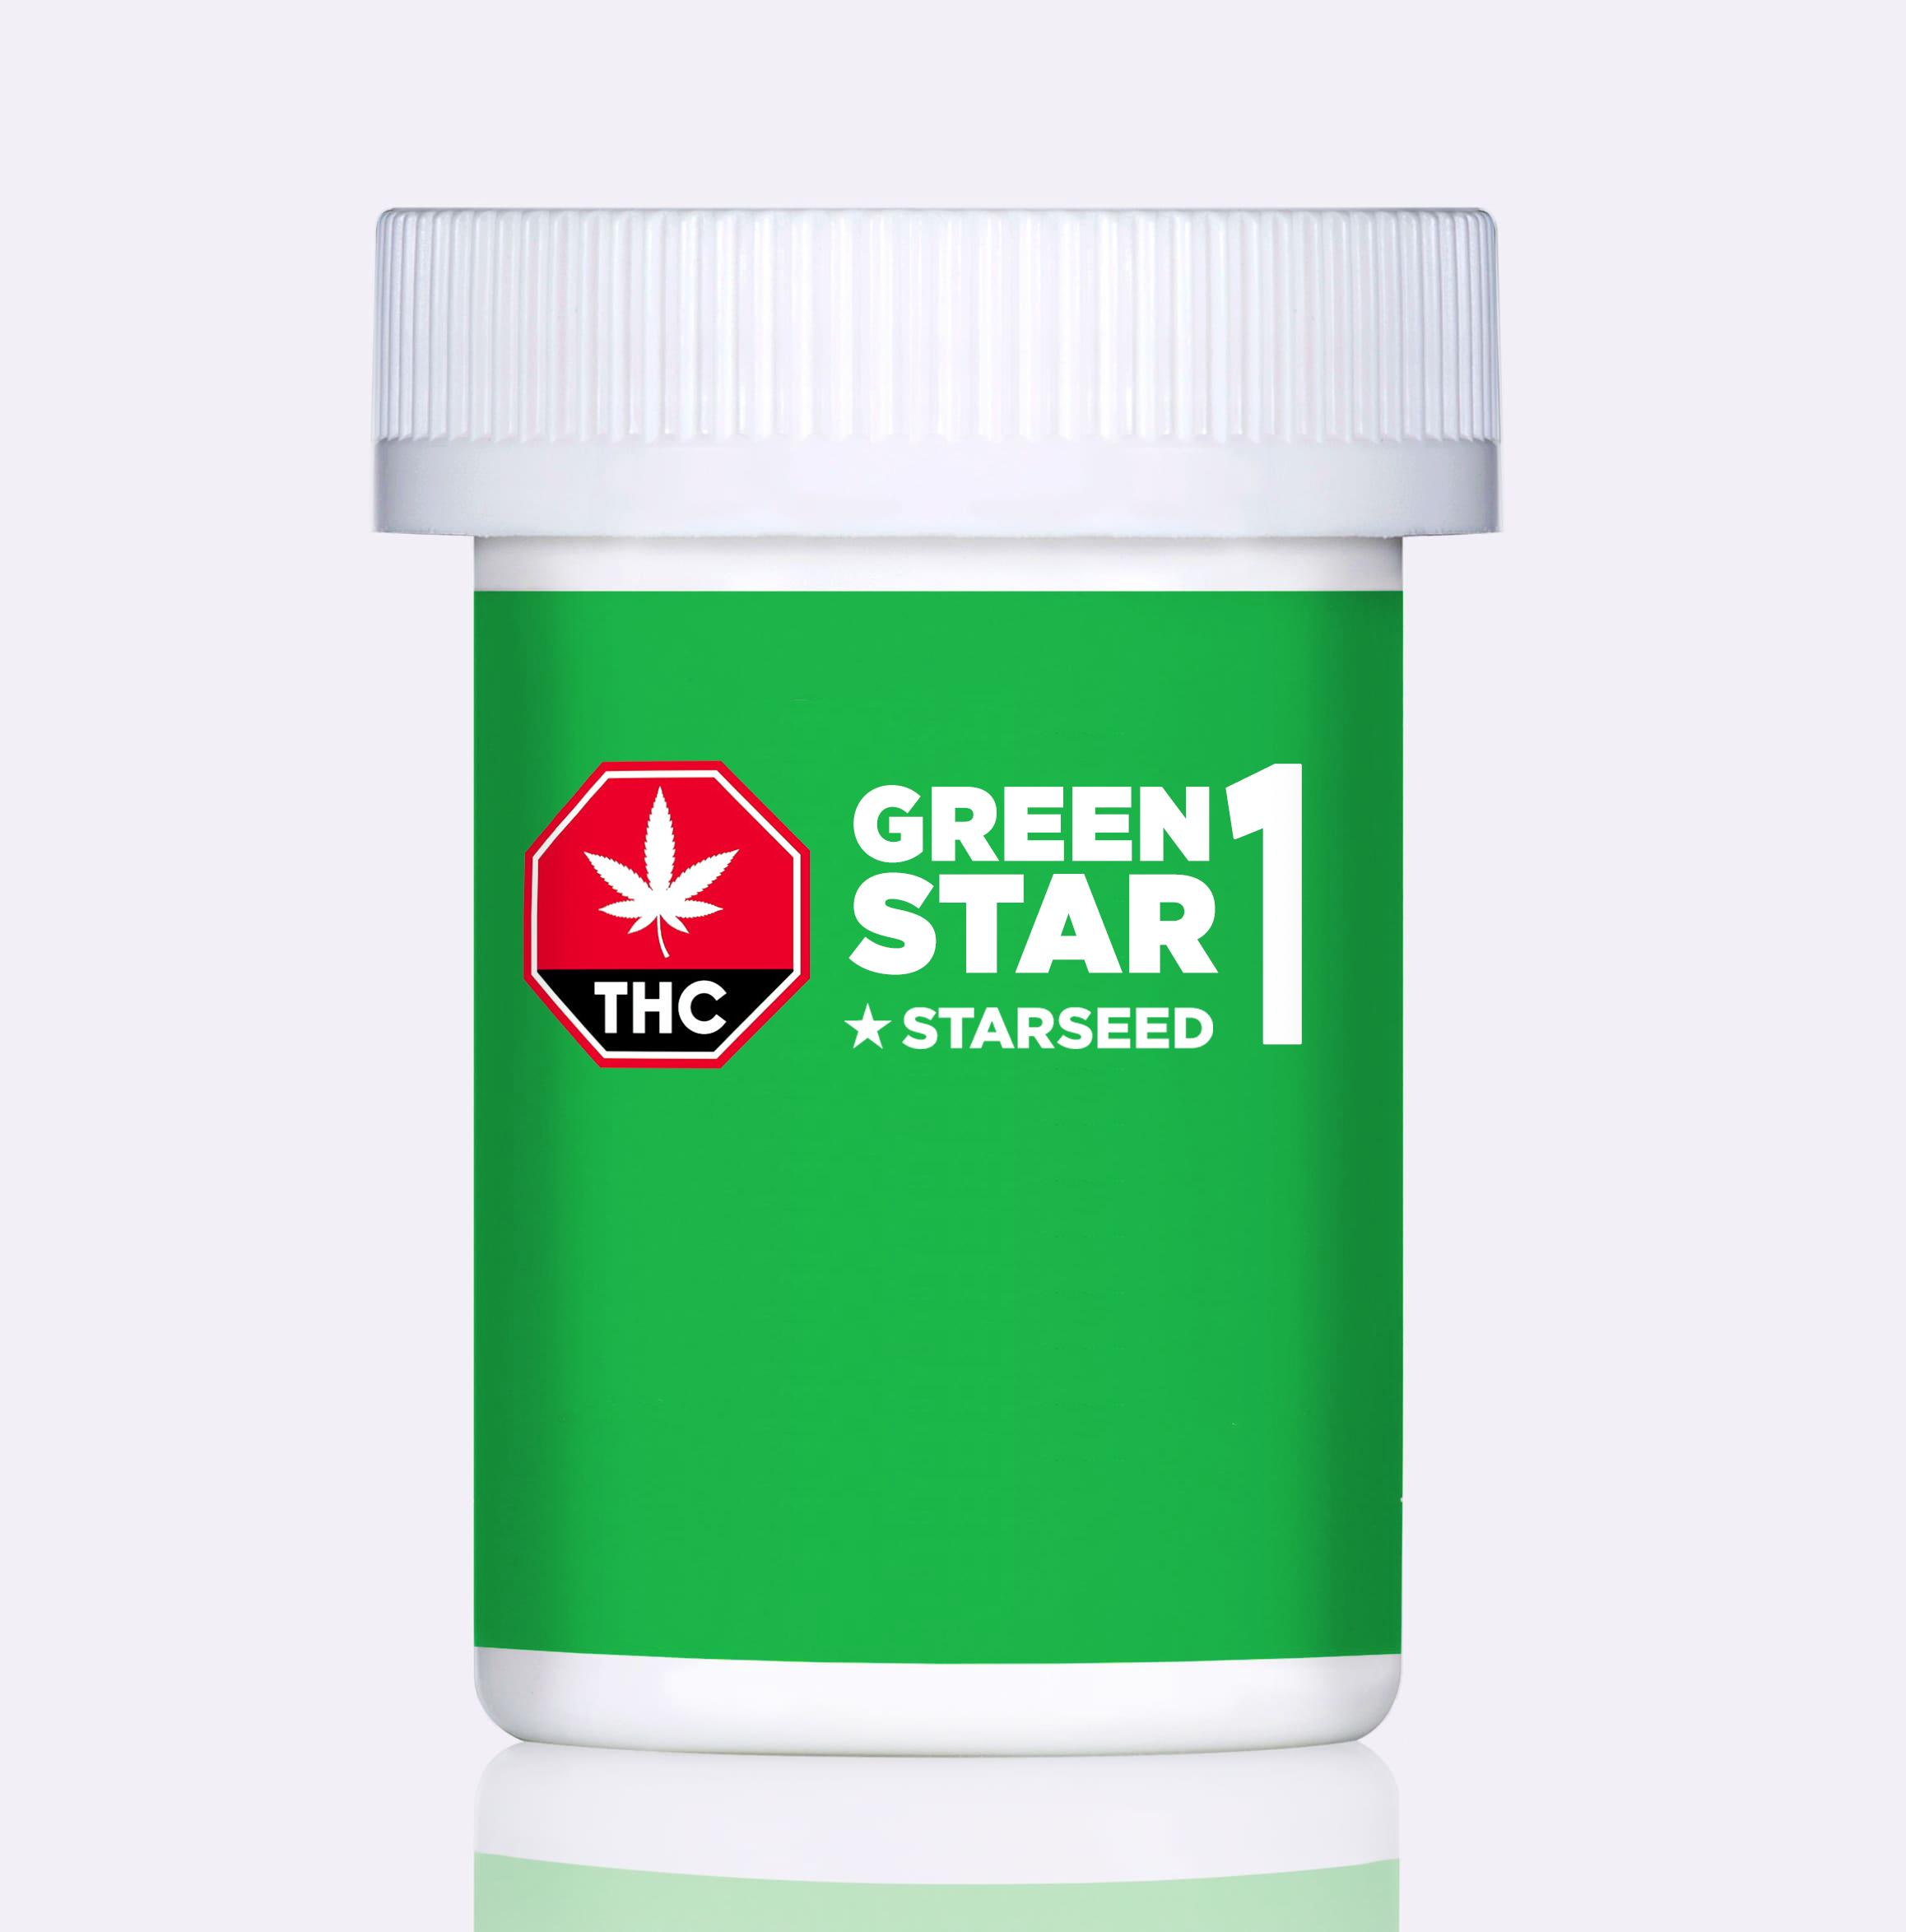 Starseed Green Star 1 - 5g